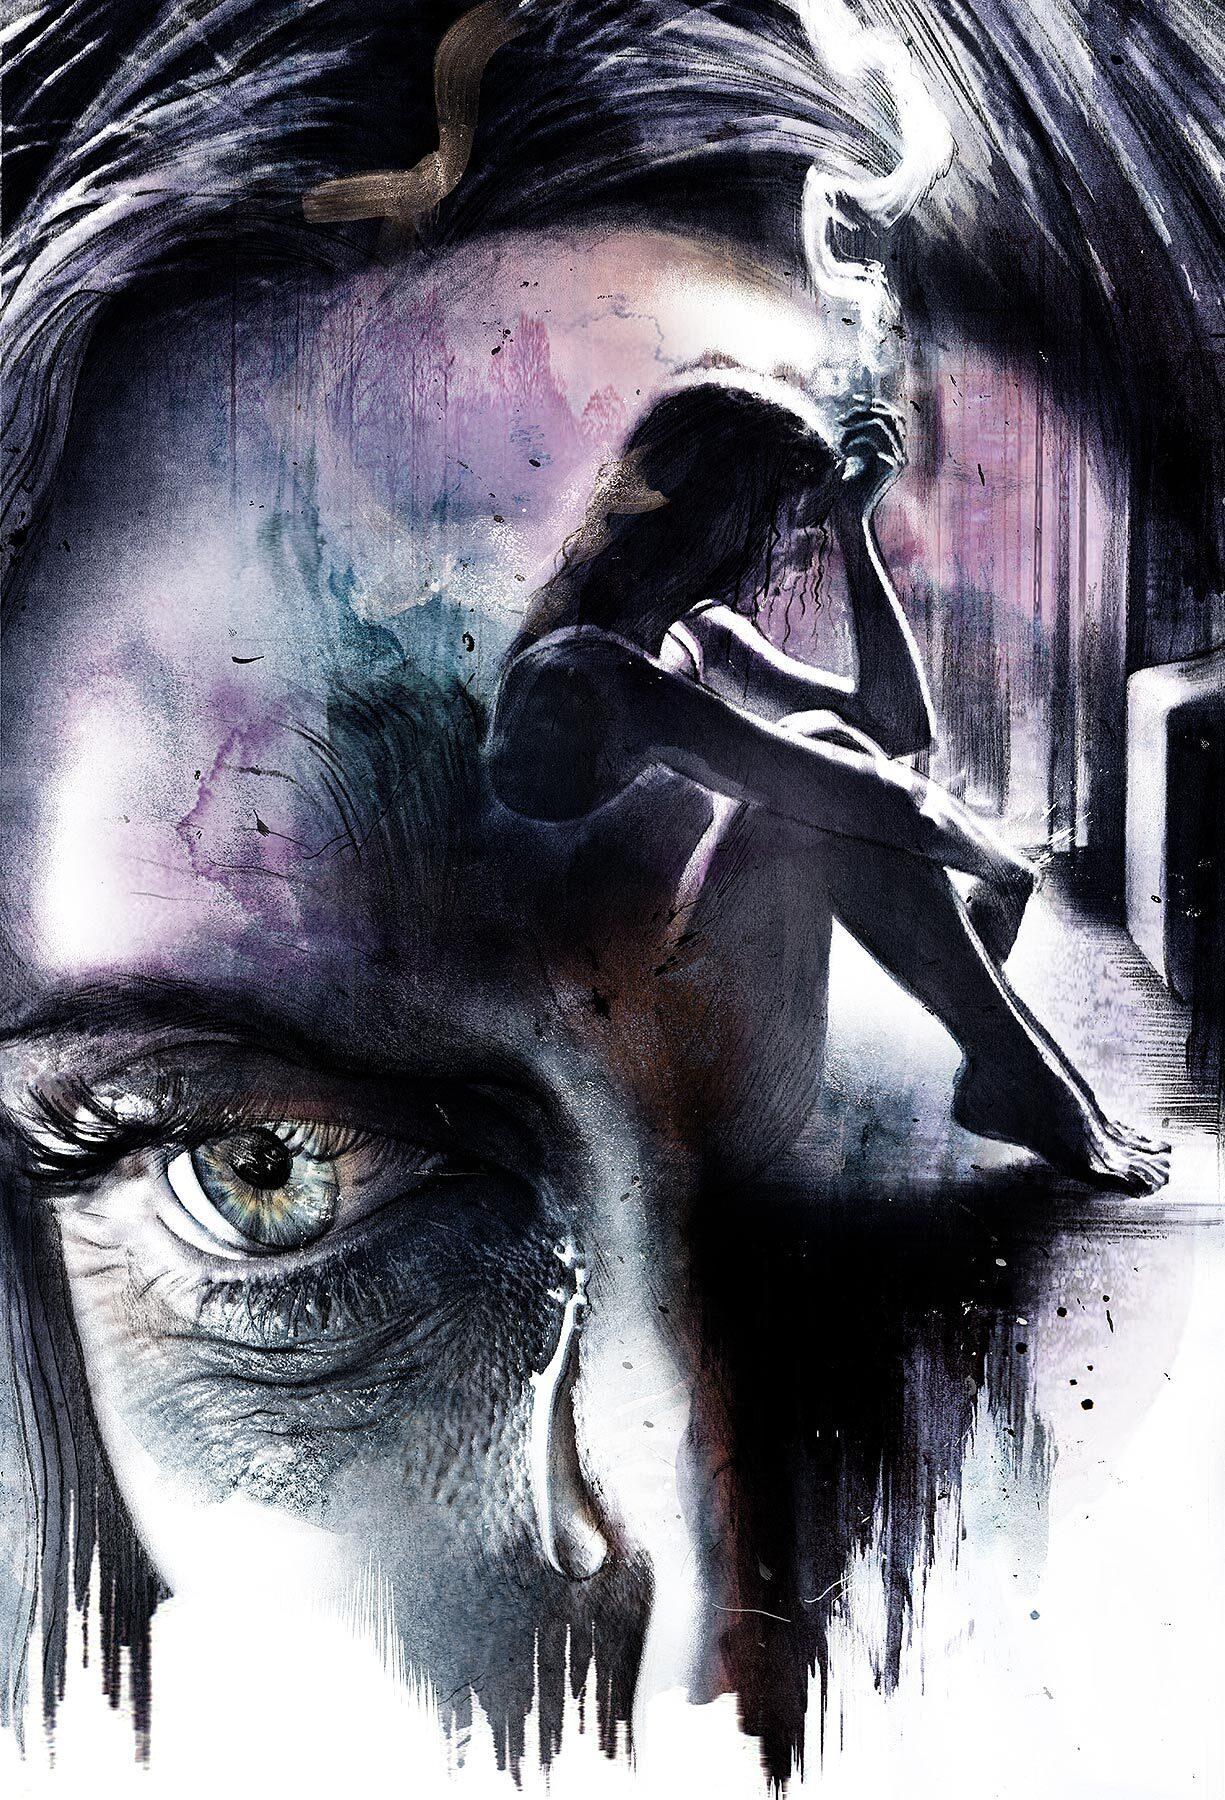 Shadow mind editorial illustration dark - Kornel Illustration | Kornel Stadler portfolio